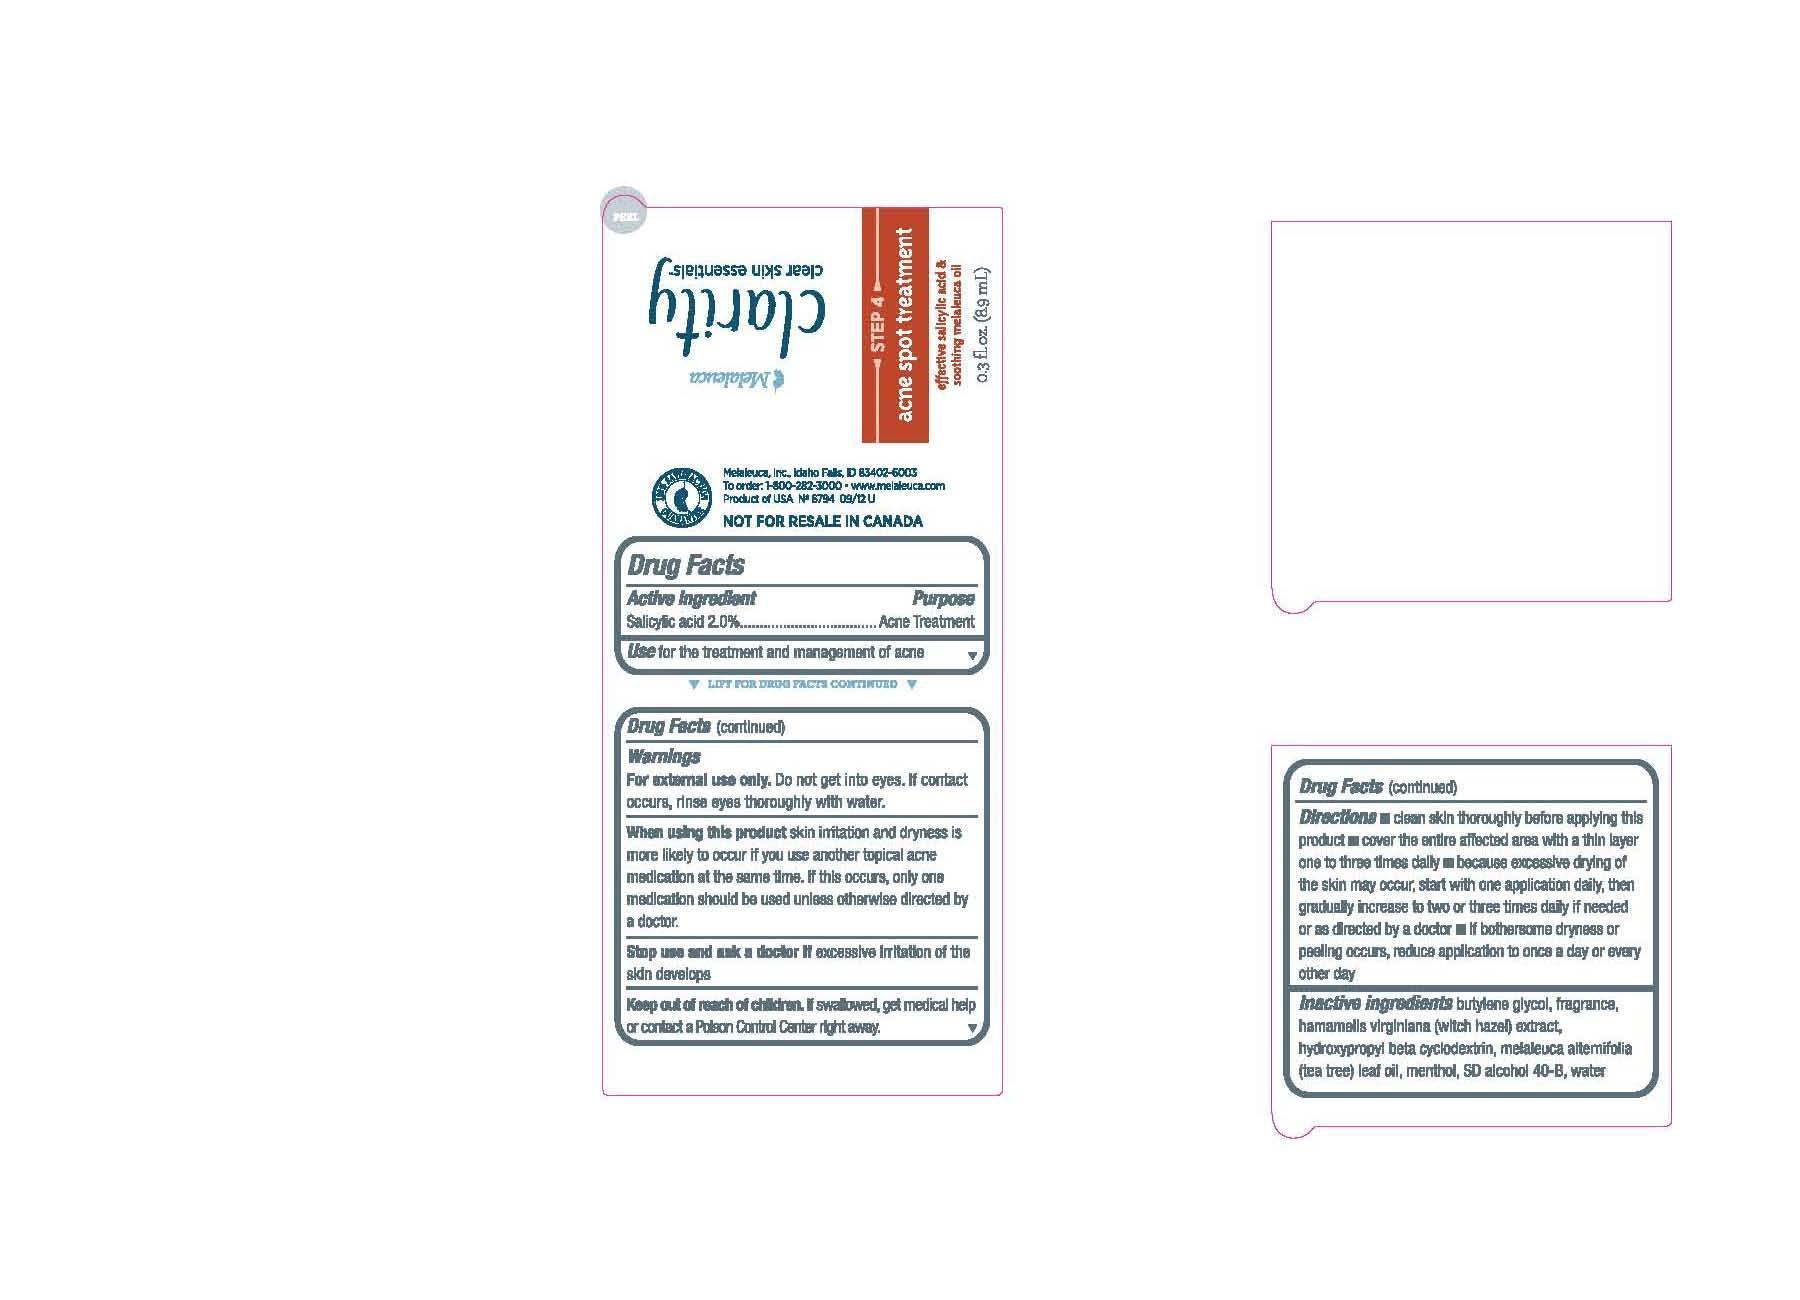 Clarity Clear Skin Essentials Acne Spot Treatment (Salicylic Acid) Cream [Melaleuca Inc.]